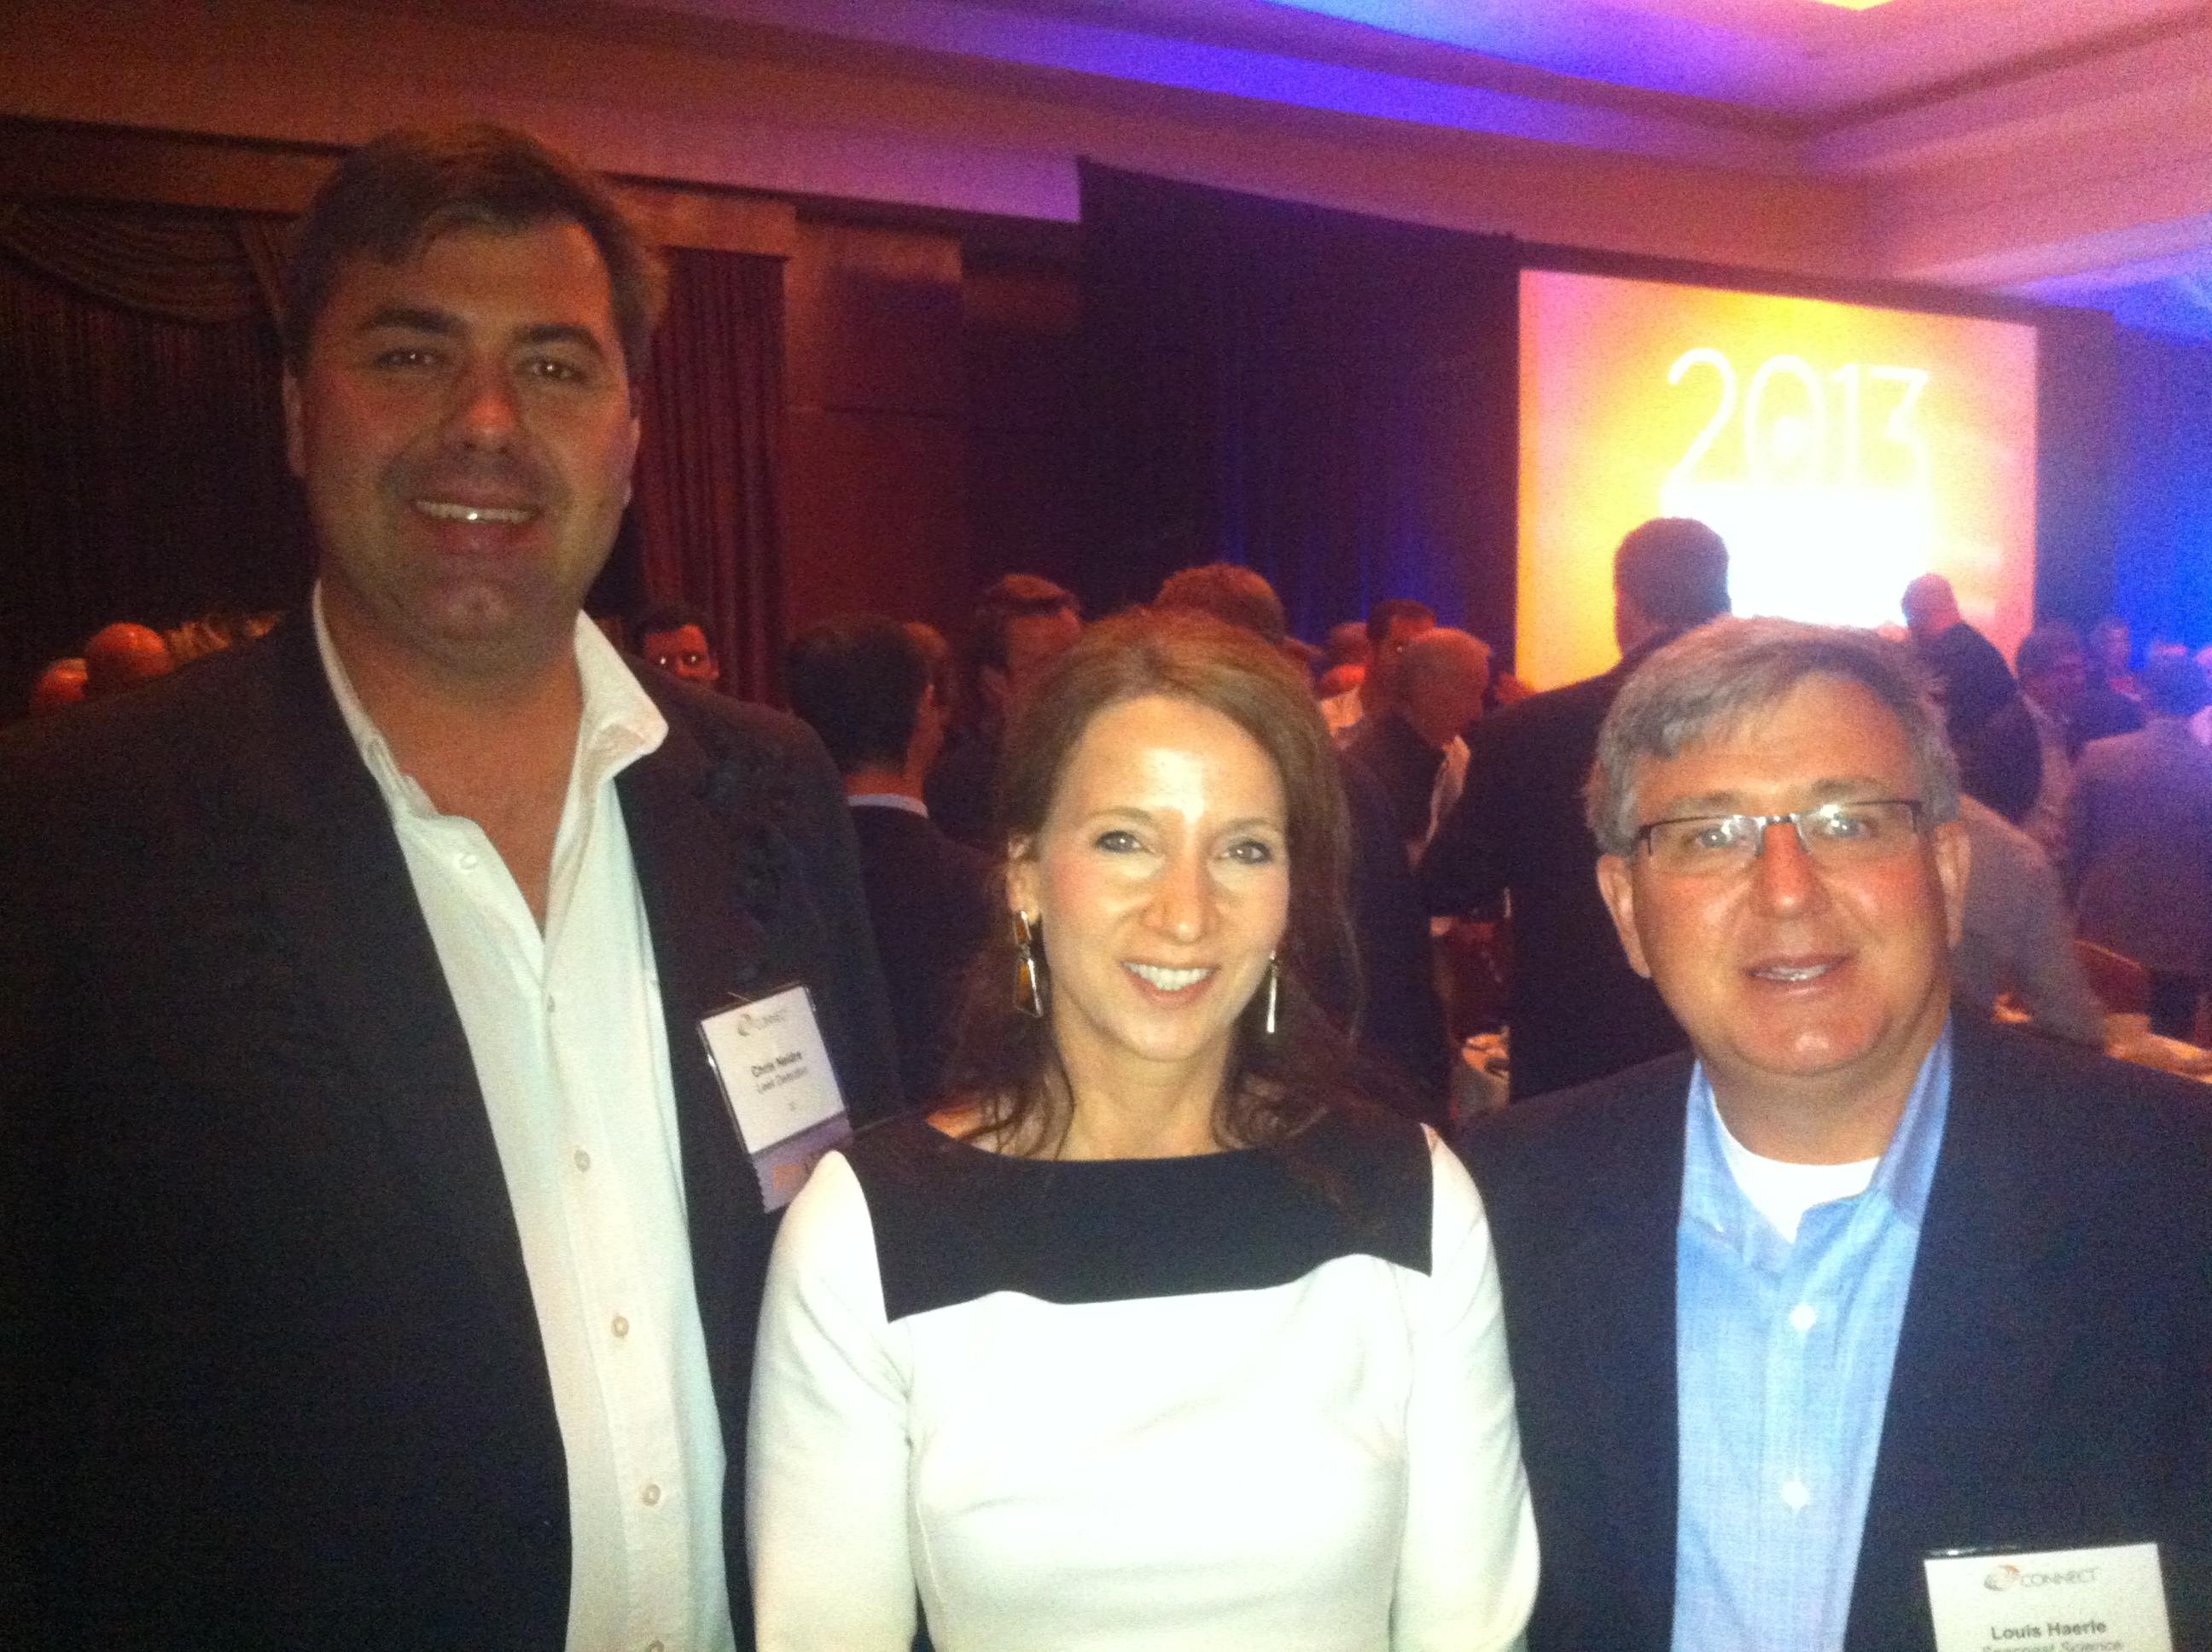 Peggy Fleming, Präsident der German American Chamber of Commerce California, mit den Finalisten Chris Neidre (links) and Louis Haerle (rechts)